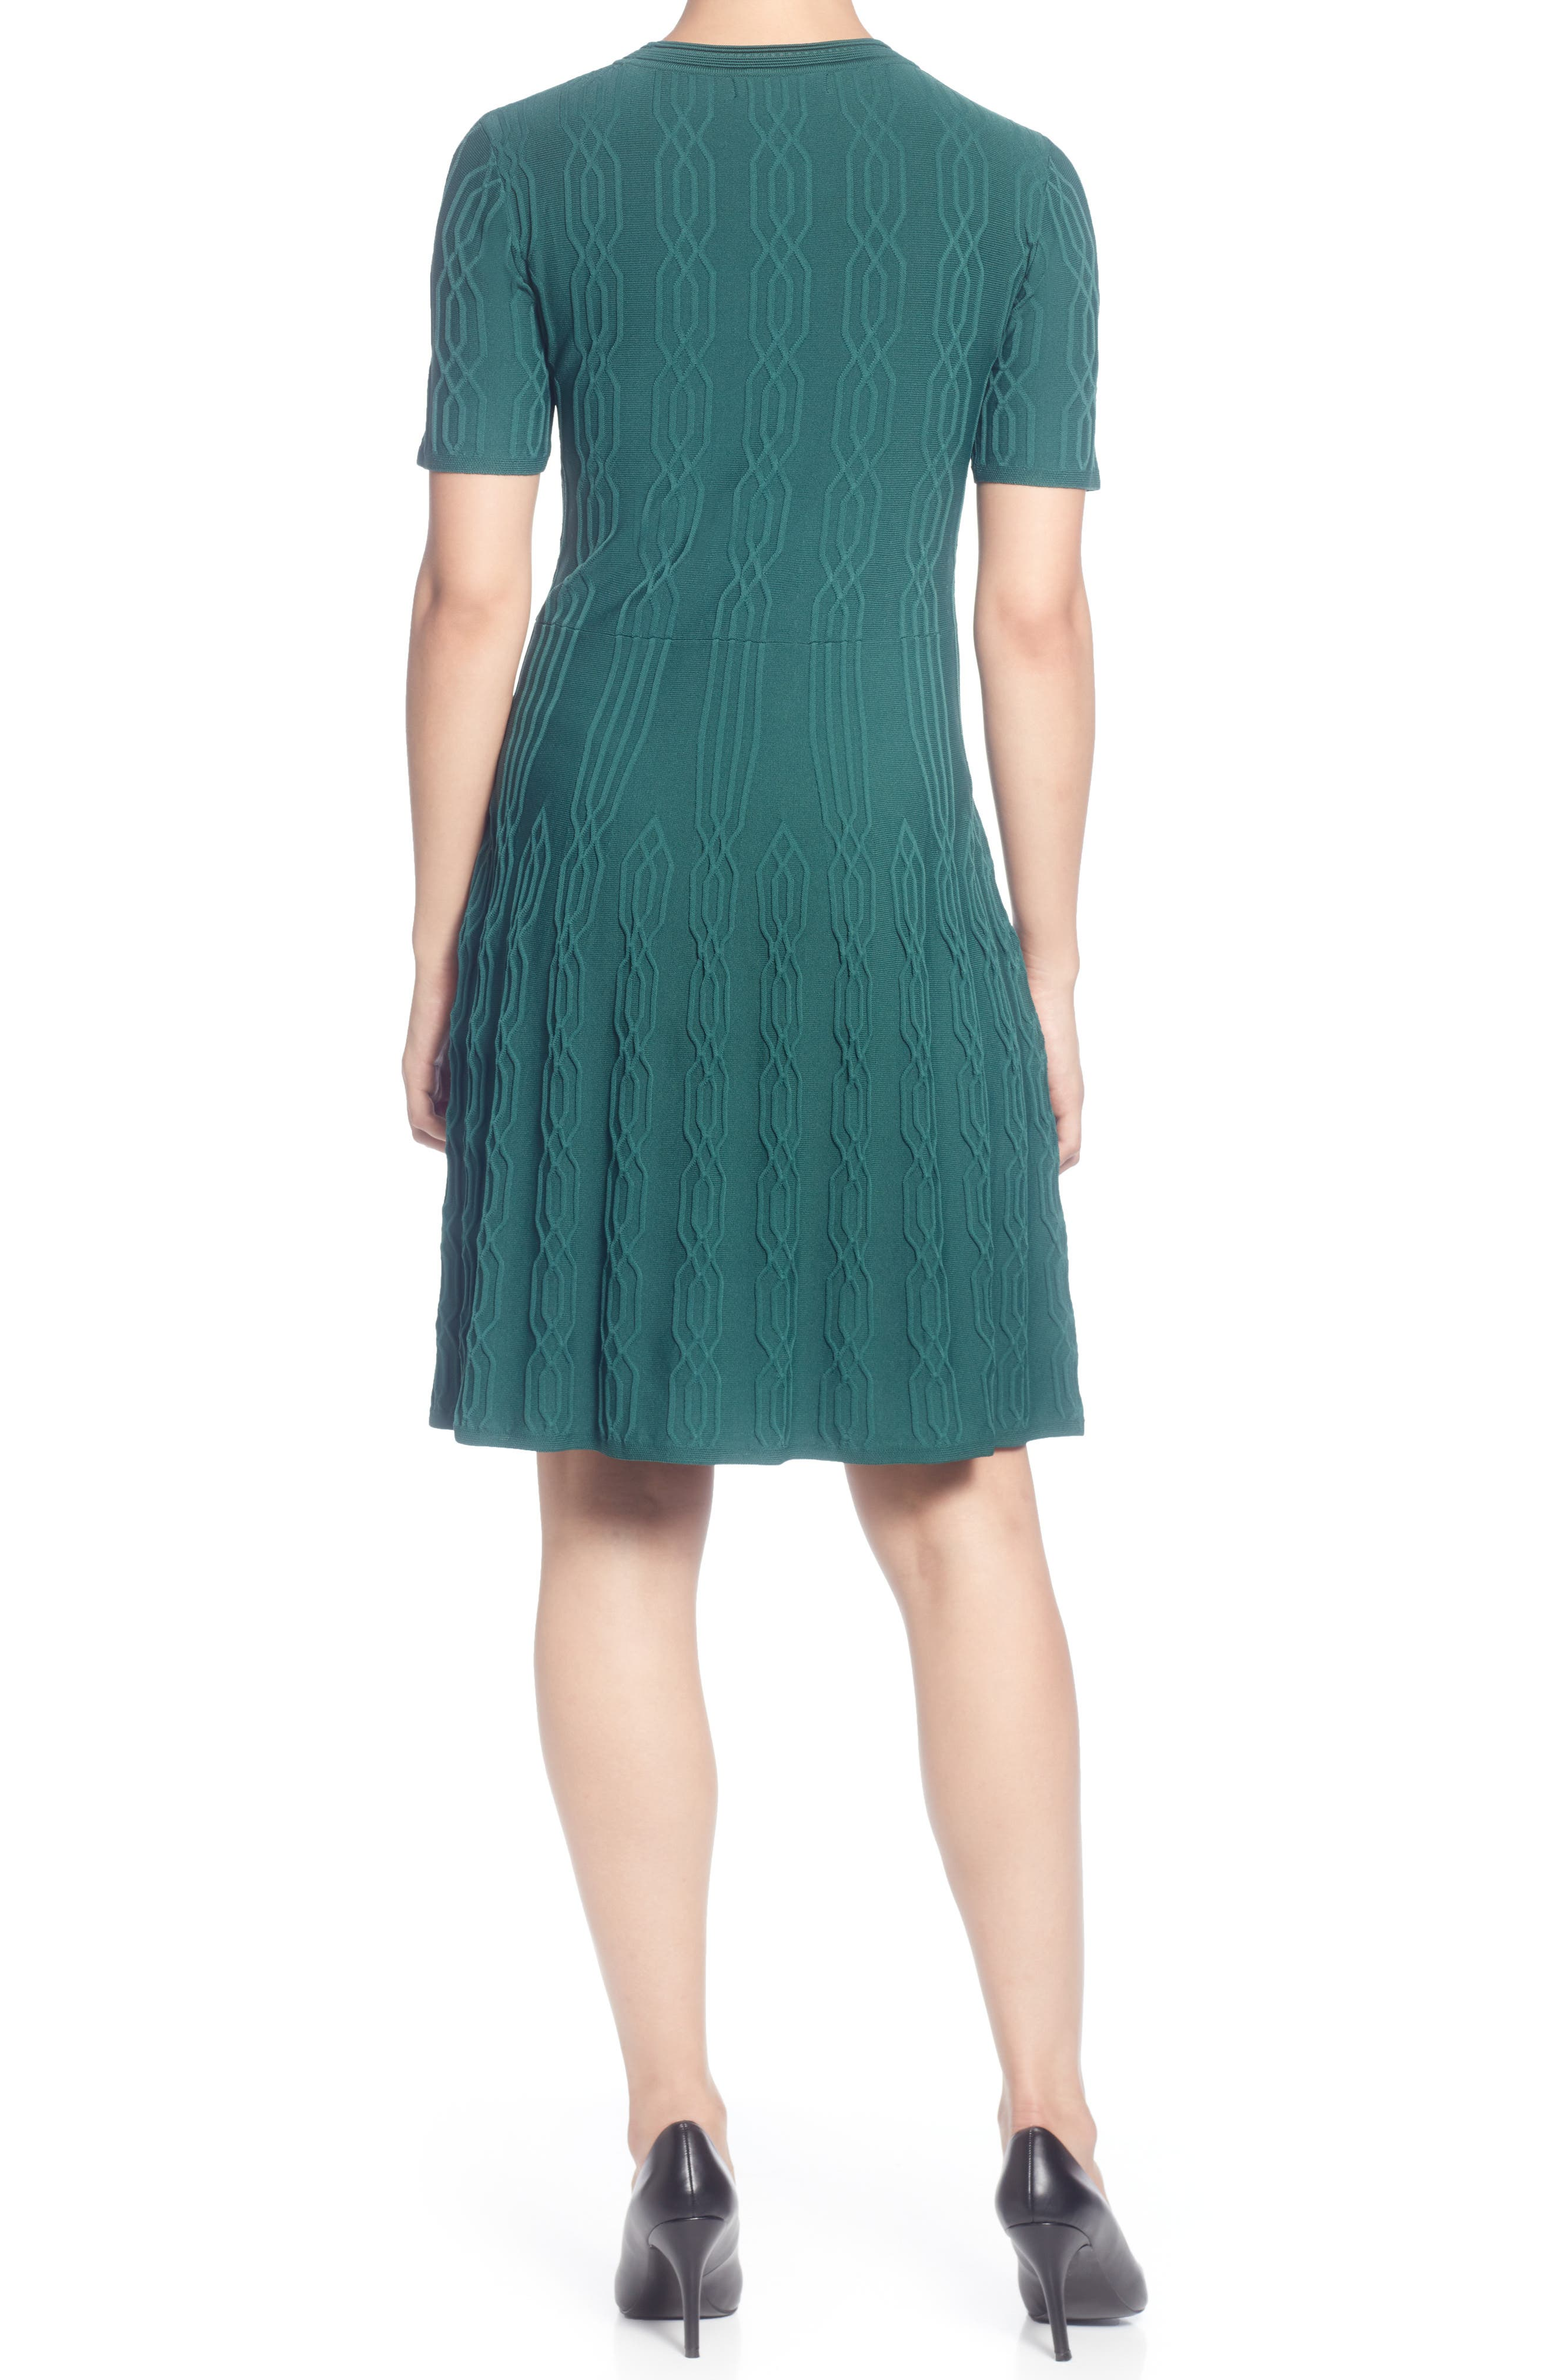 CATHERINE CATHERINE MALANDRINO,                             Jacquard Sweater Dress,                             Alternate thumbnail 2, color,                             JUNE BUG